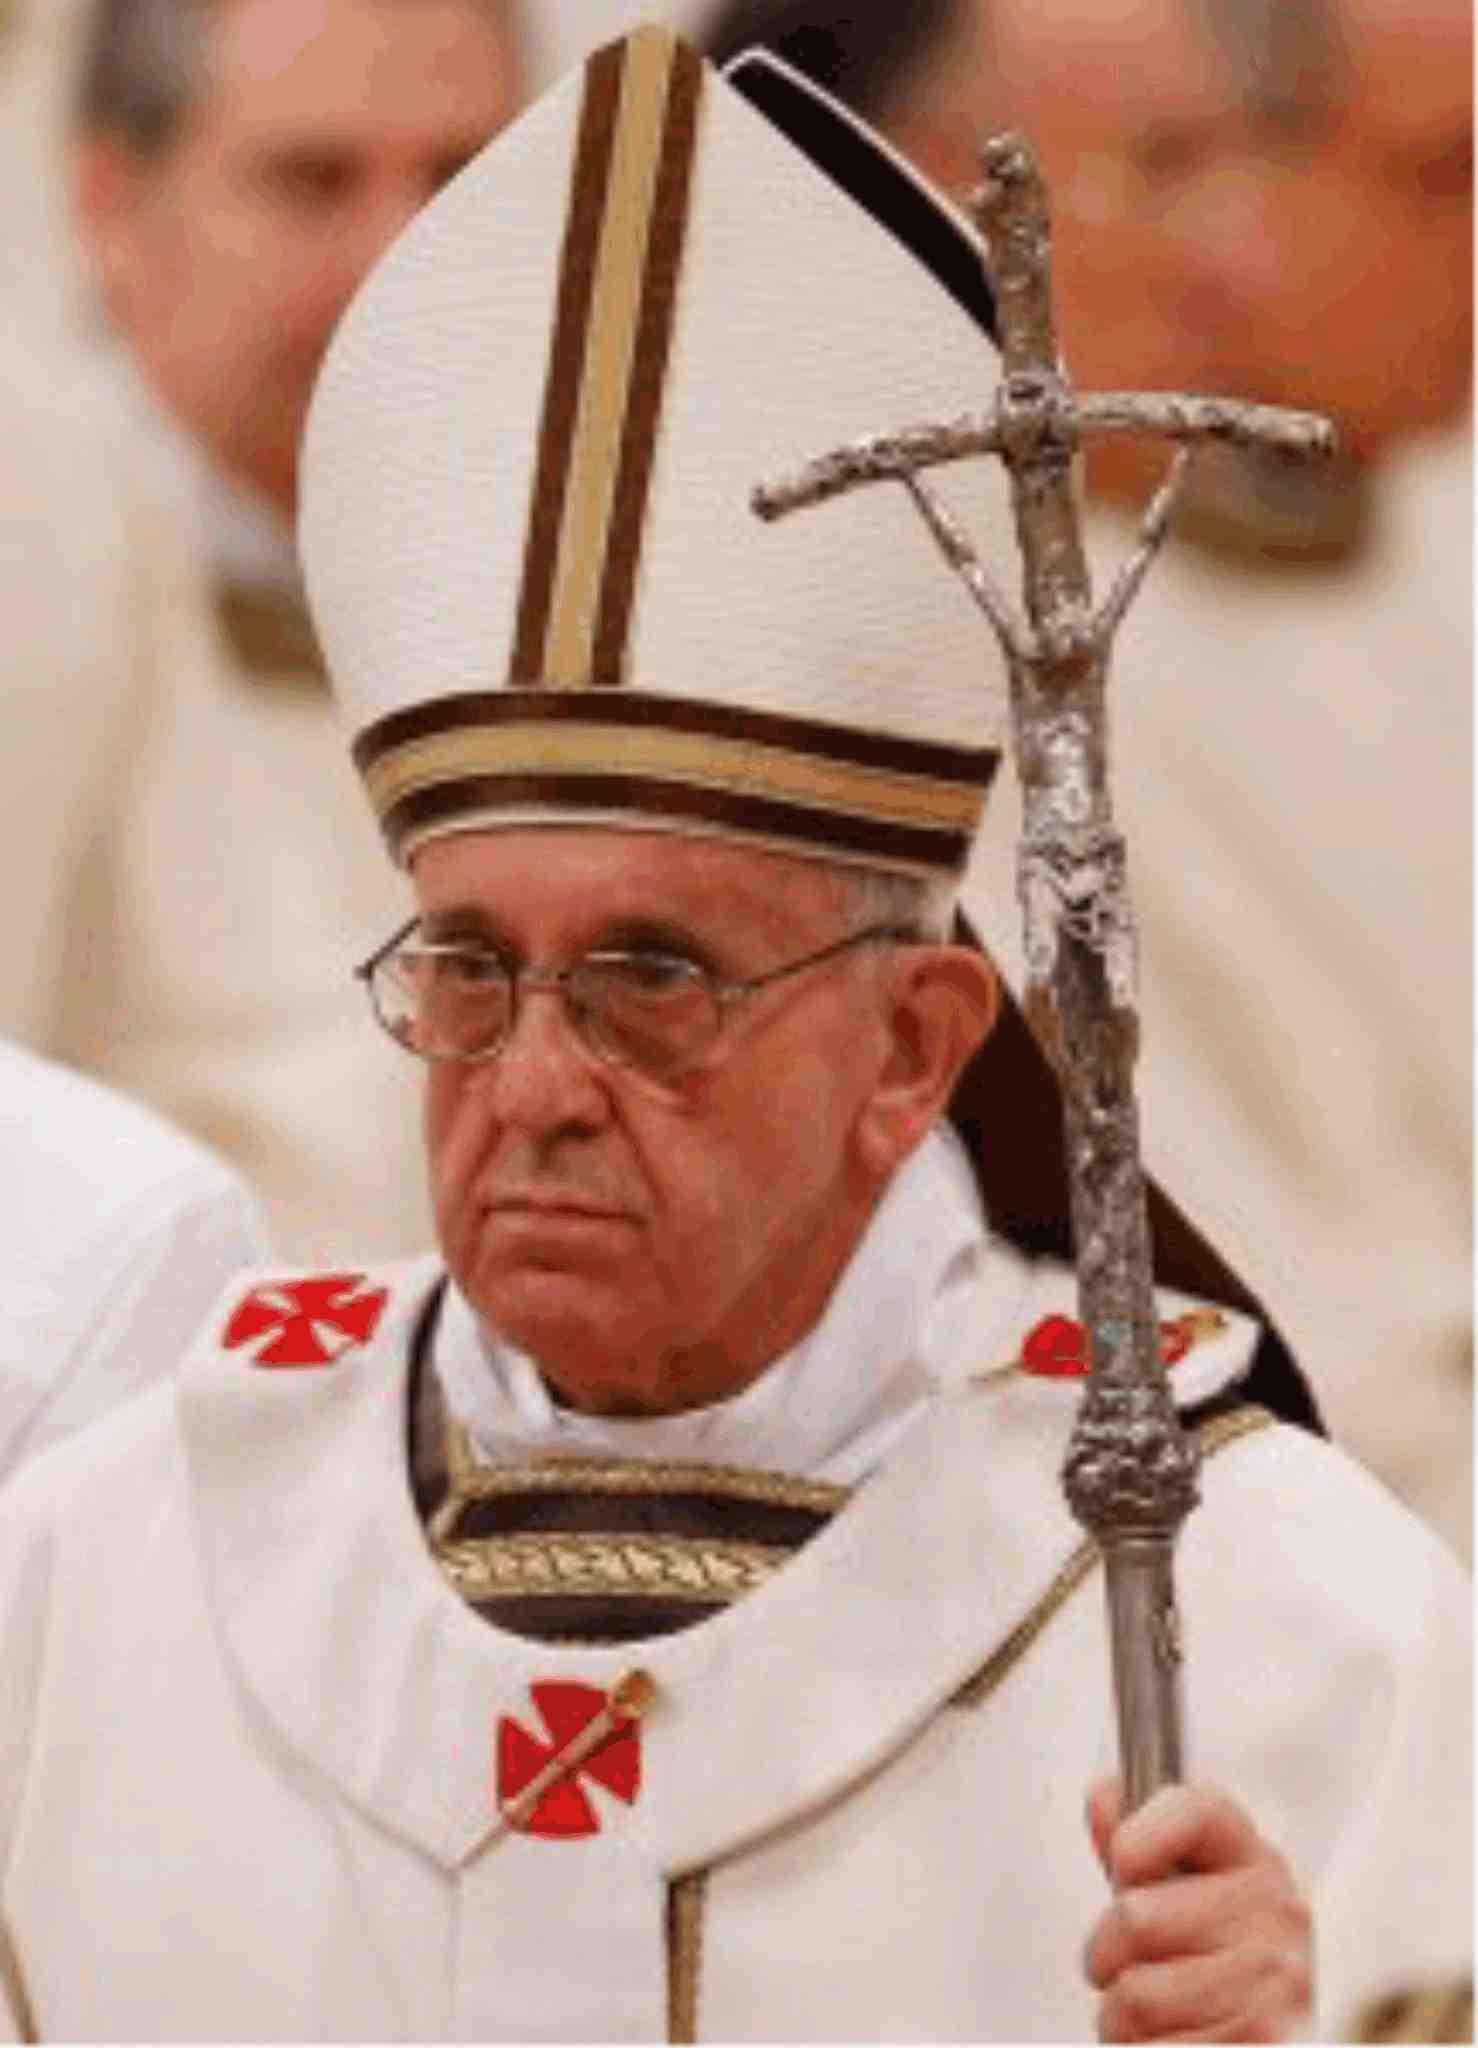 Satans bride the roman catholic church the vatican part 3 bent cross bent cross2 bent cross3 buycottarizona